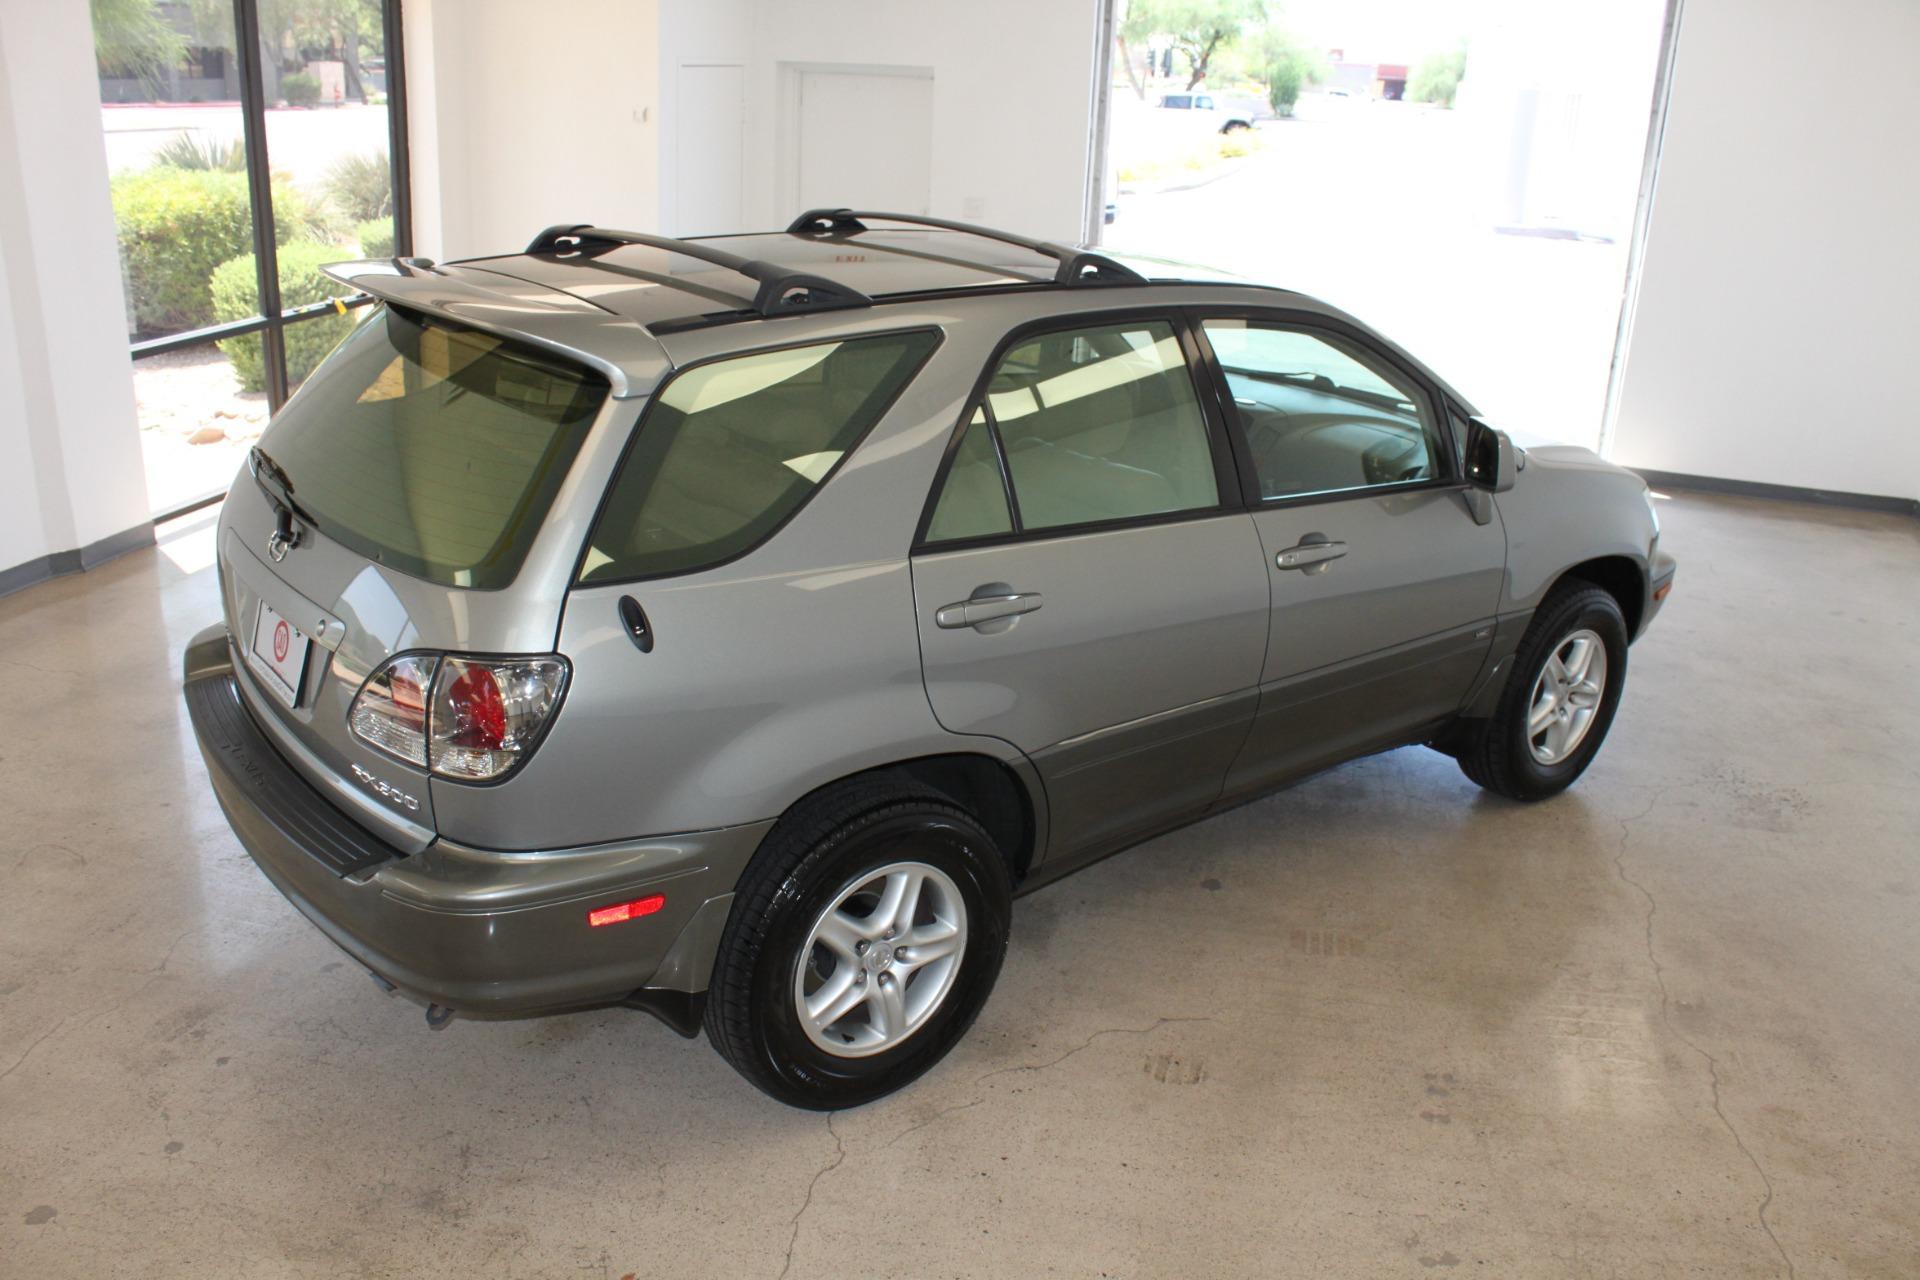 Used-2002-Lexus-RX-300-Chalenger